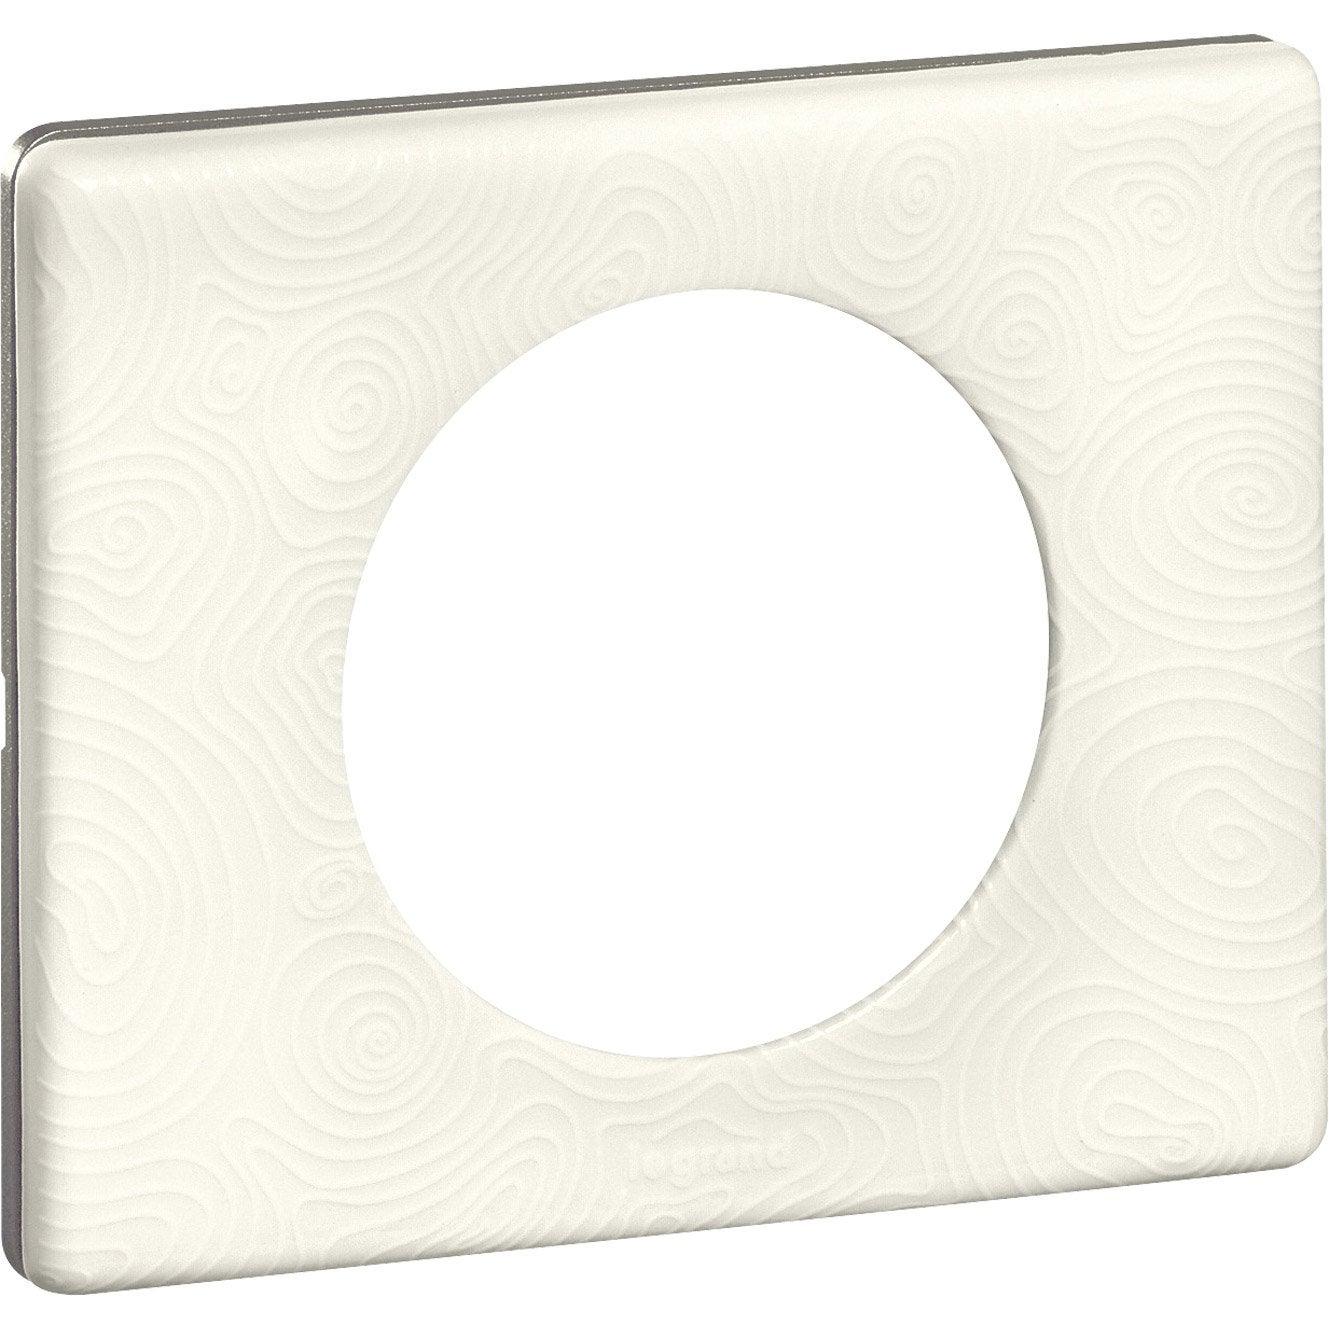 plaque simple c liane legrand songe leroy merlin. Black Bedroom Furniture Sets. Home Design Ideas